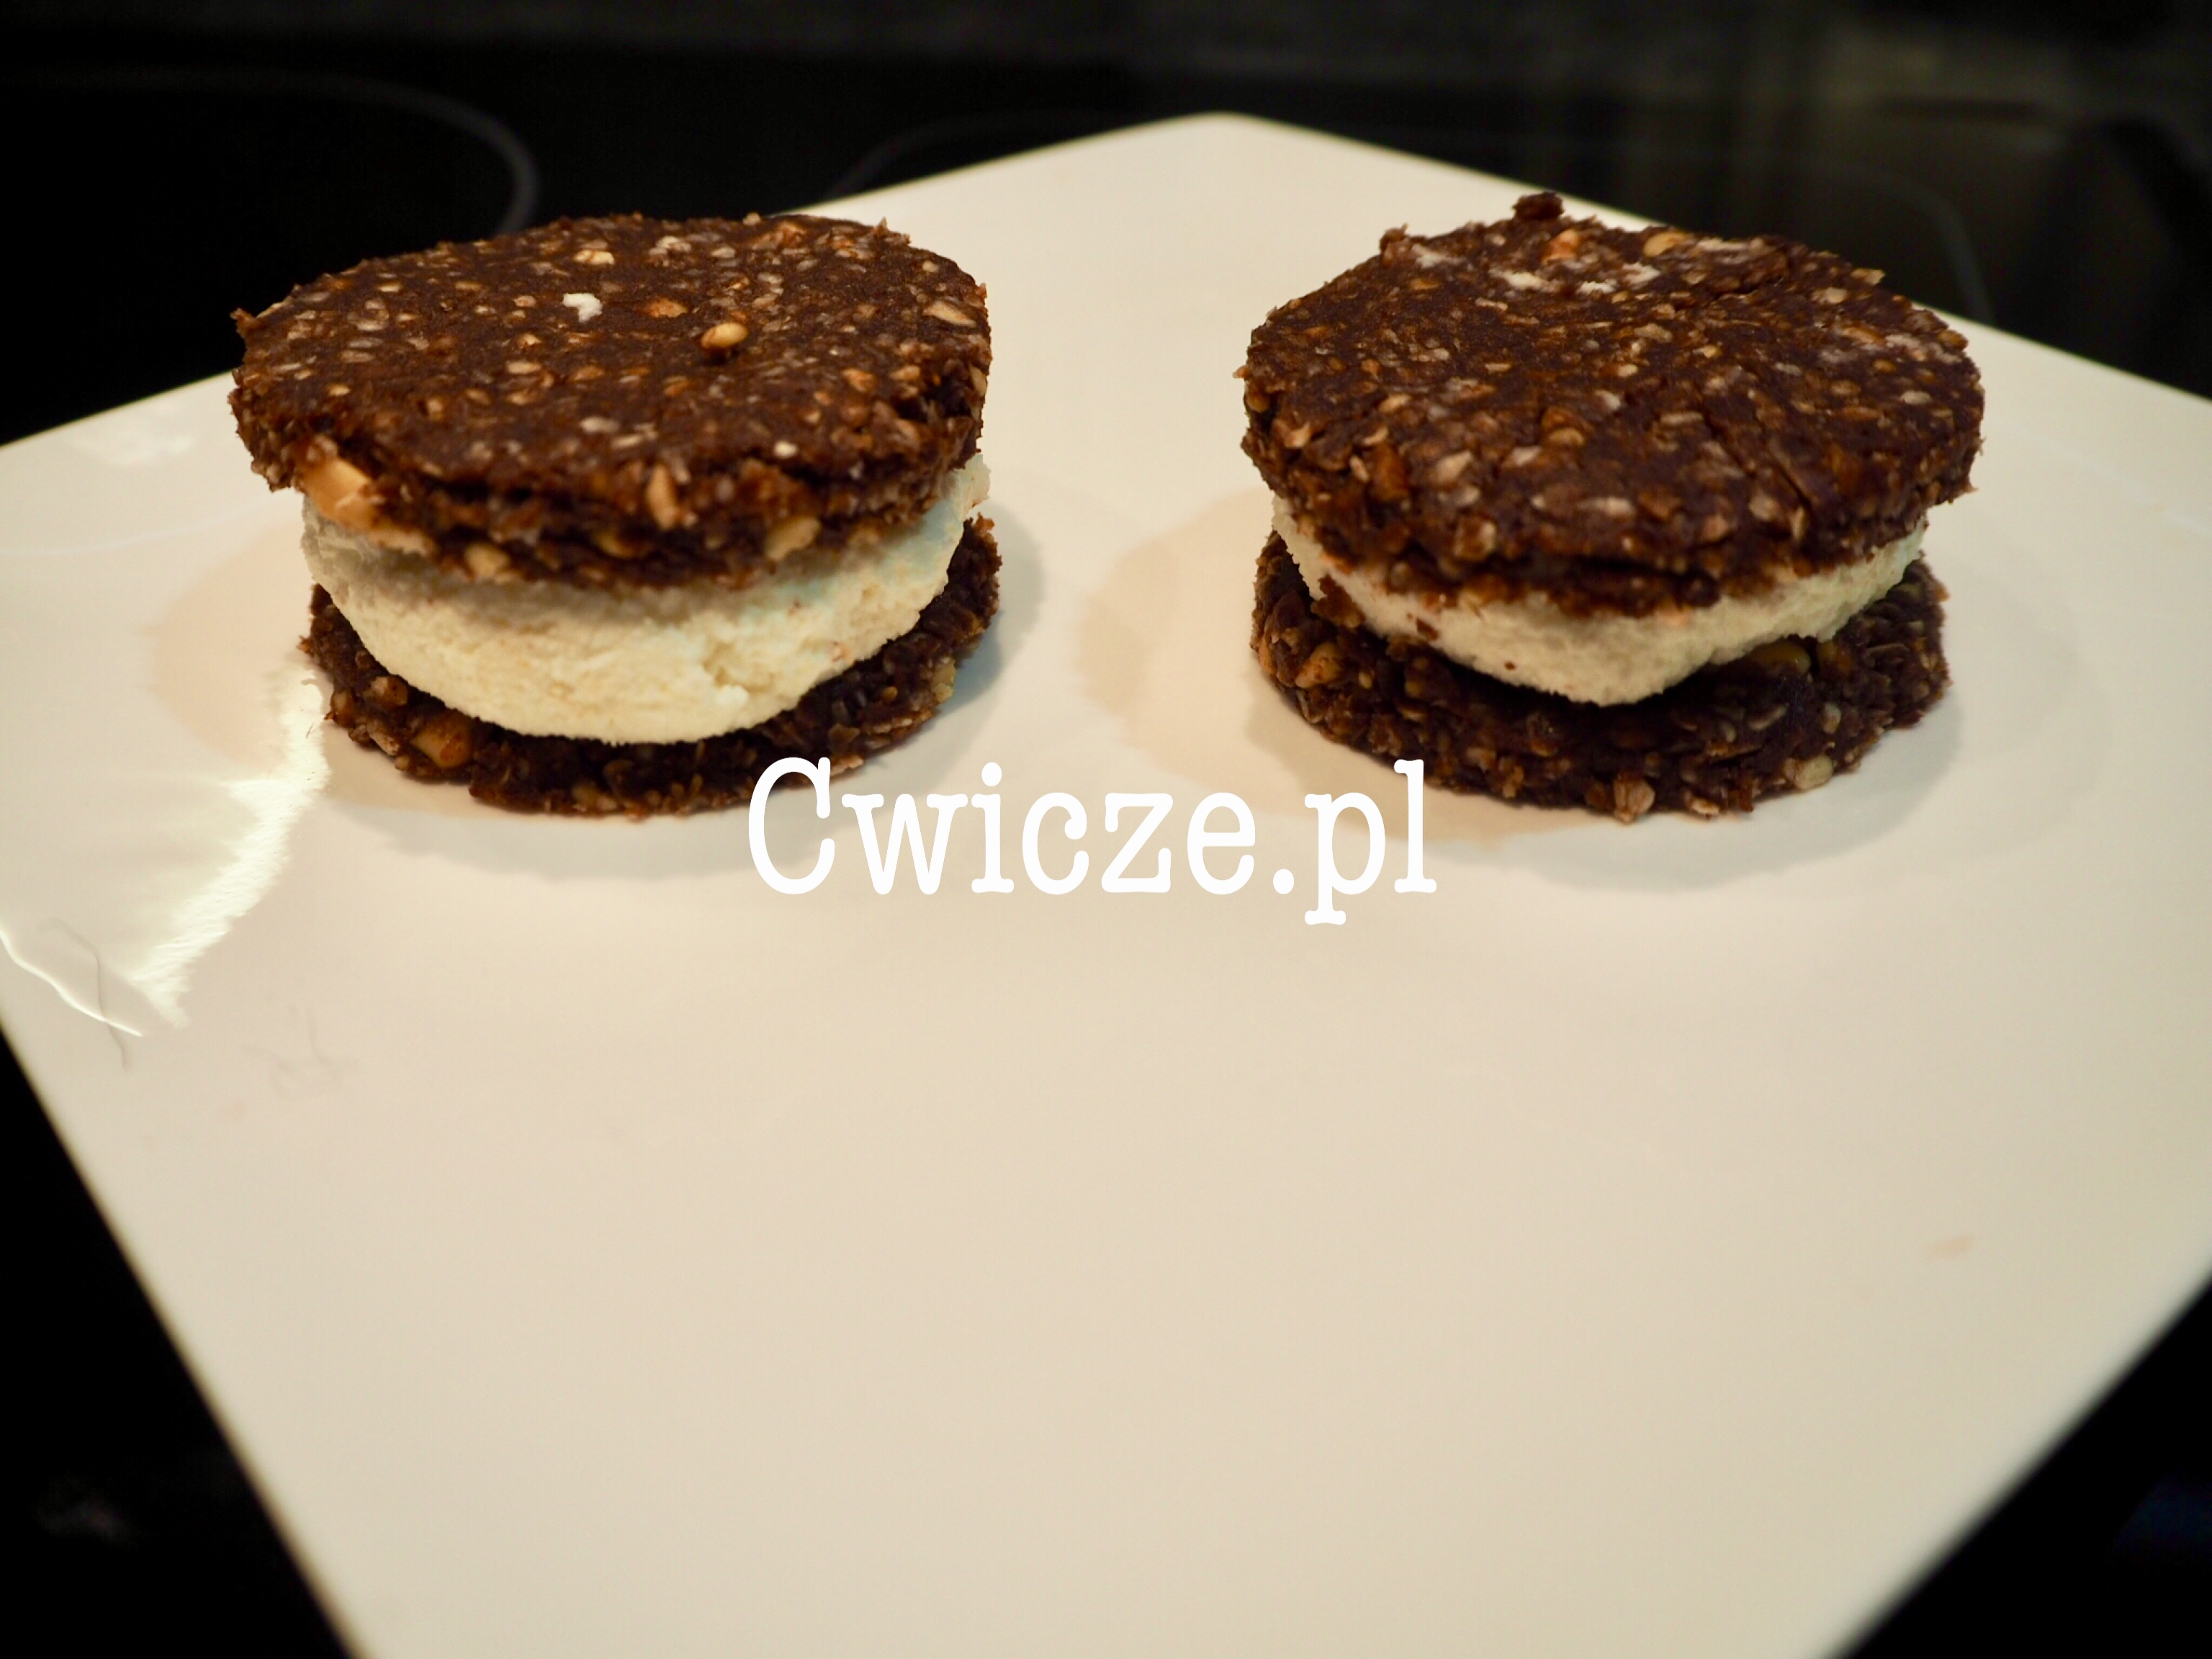 cwicze.pl